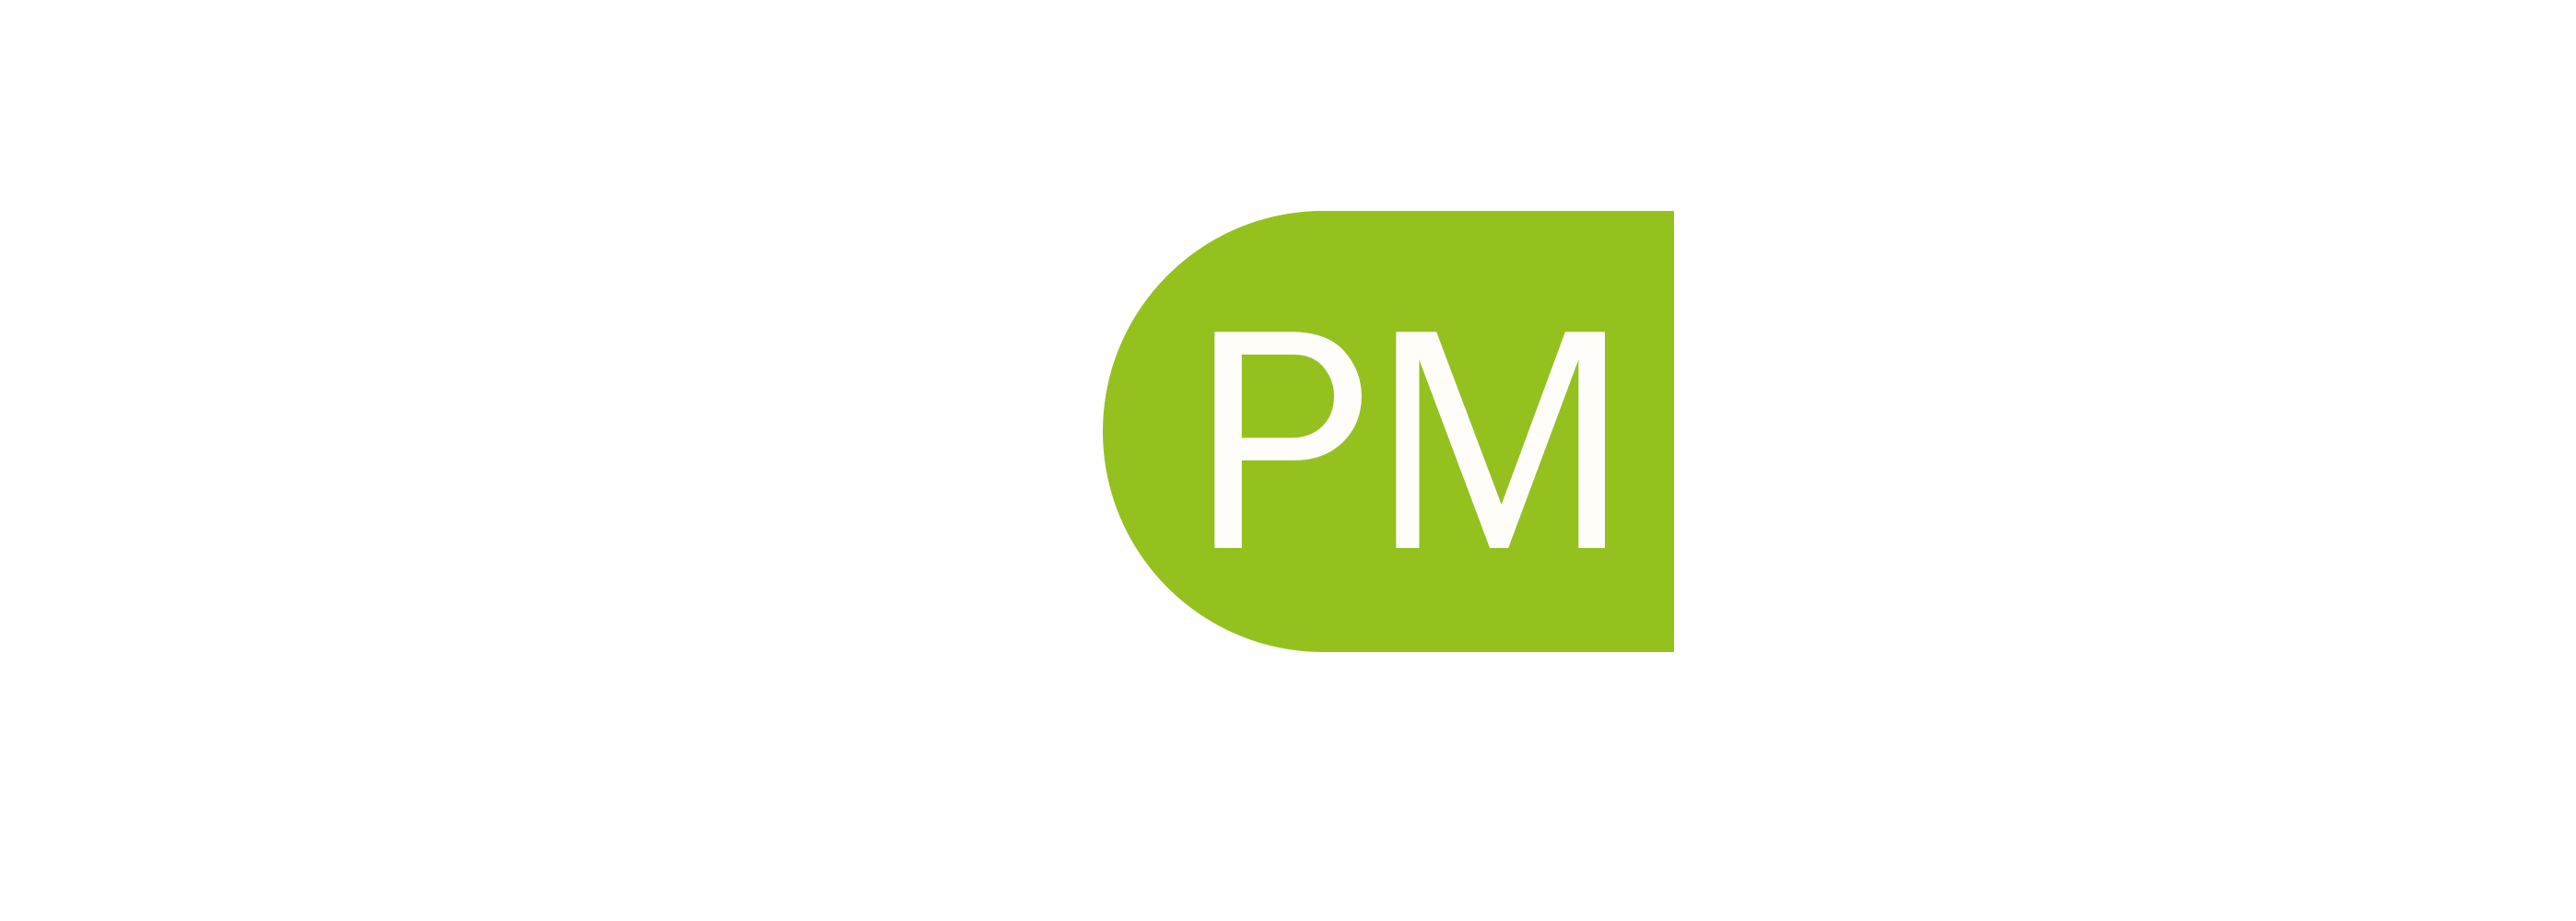 smartPM.solutions Home